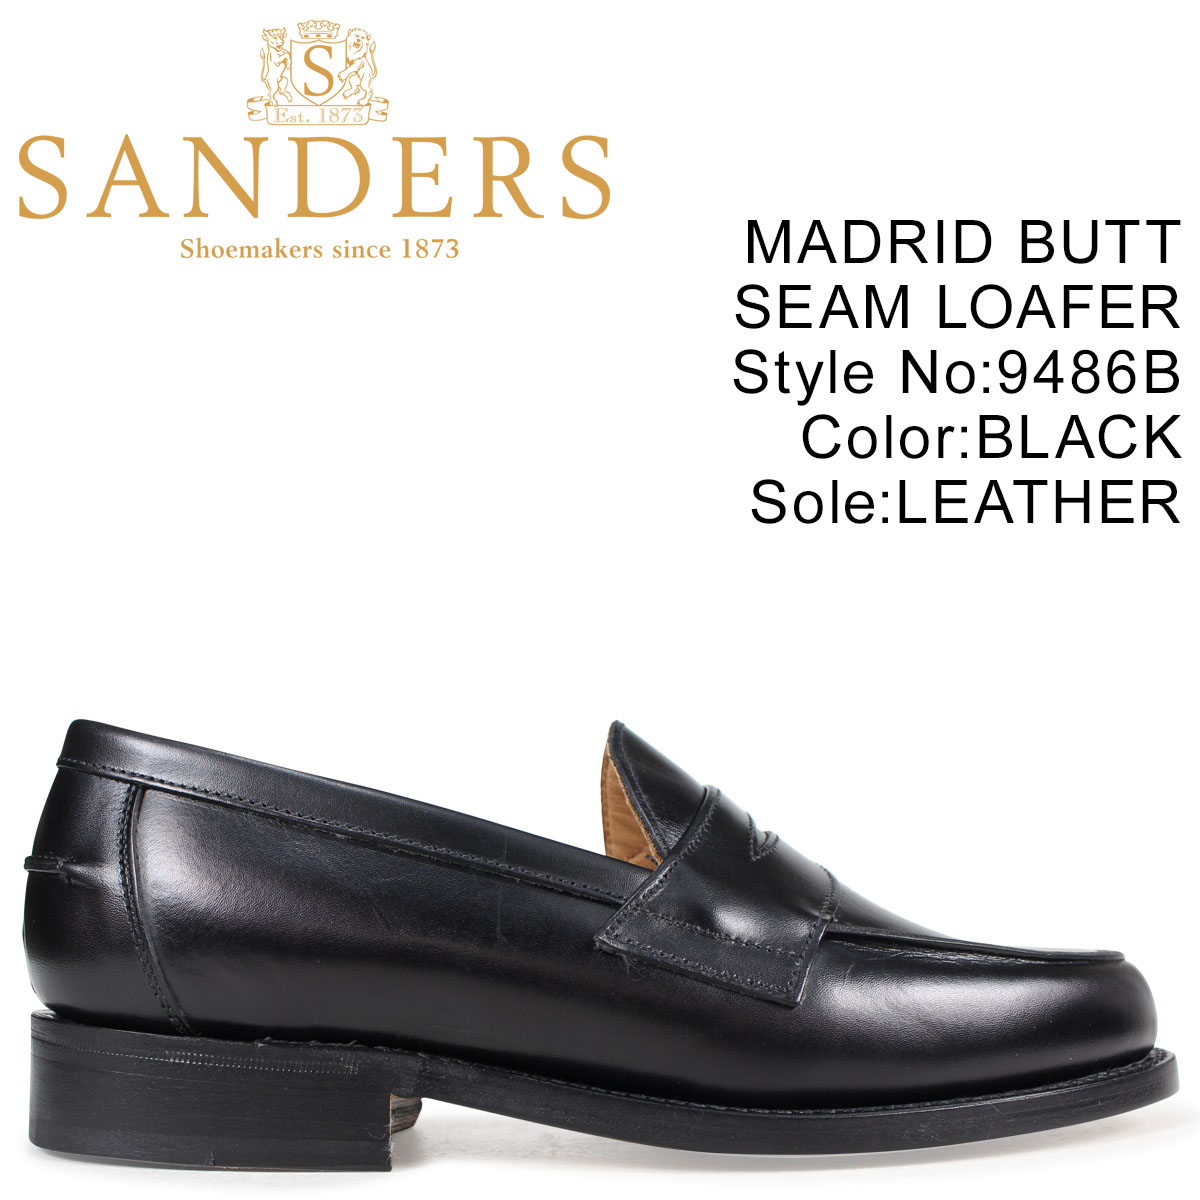 SANDERS 靴 サンダース ペニーローファー MADRID BUTT SEAM LOAFER メンズ ブラック 黒 9486B